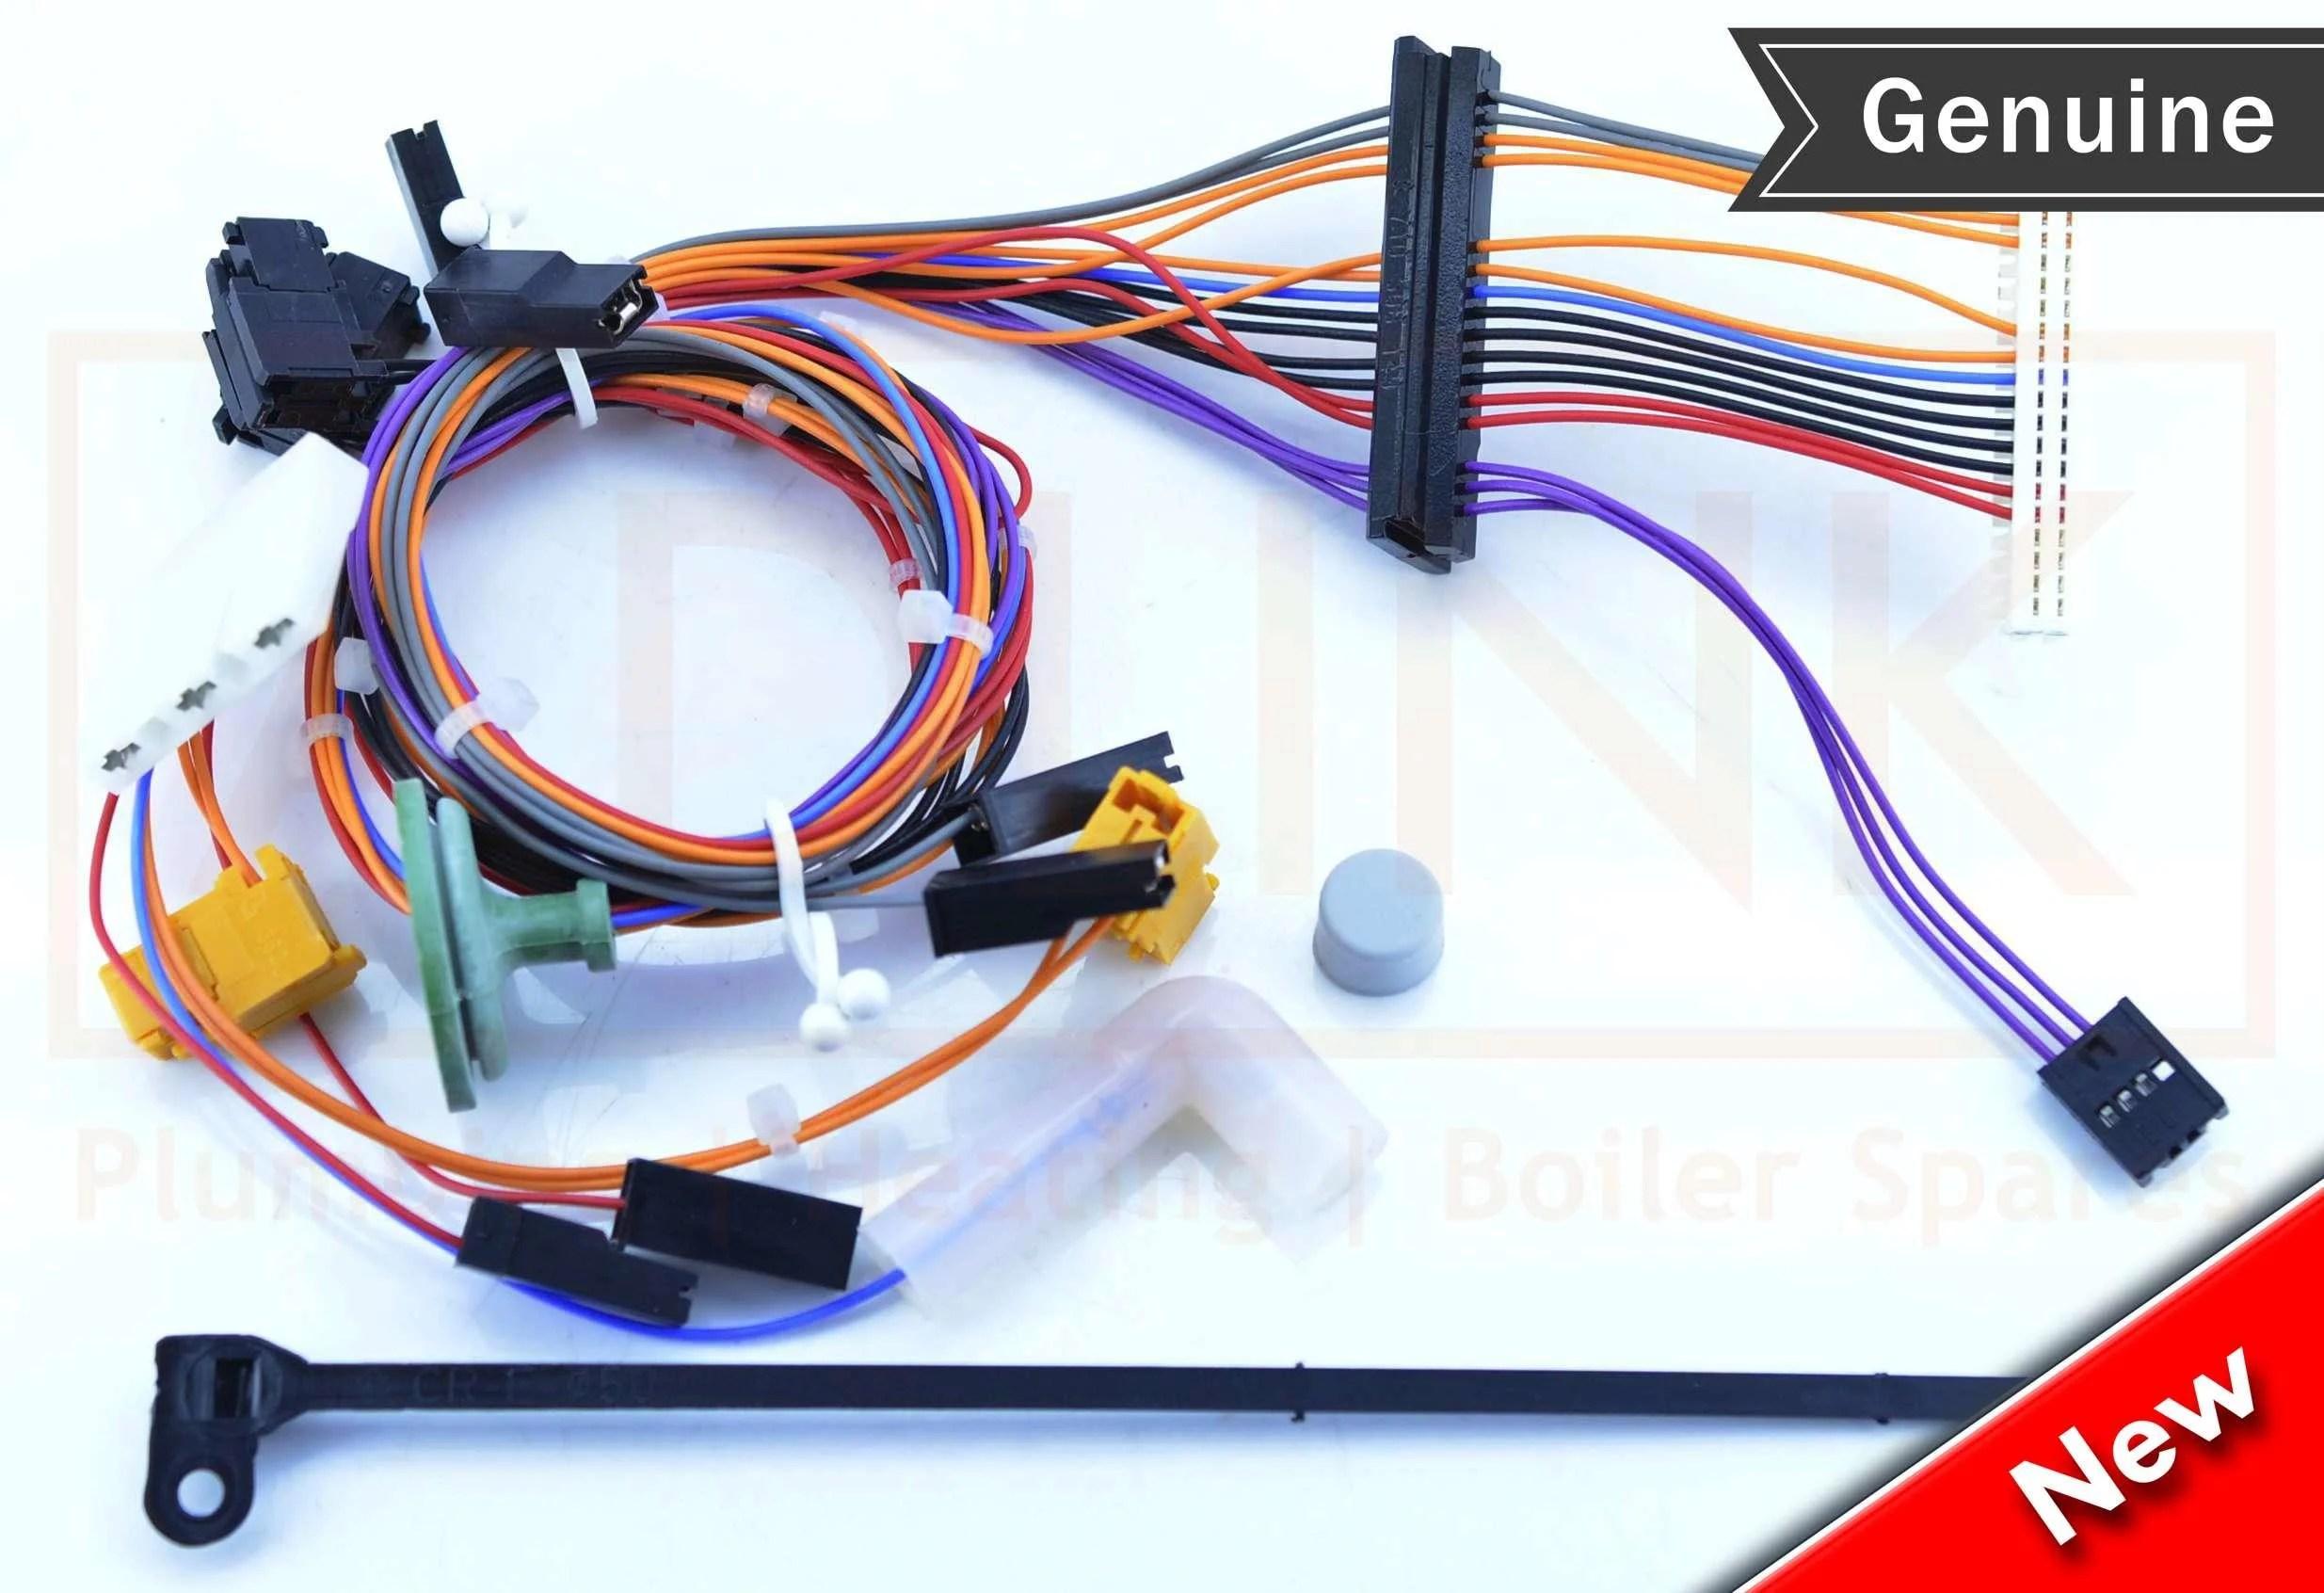 worcester bosch greenstar wiring diagram boat dual battery 25 30 r25 r30 he combi harness